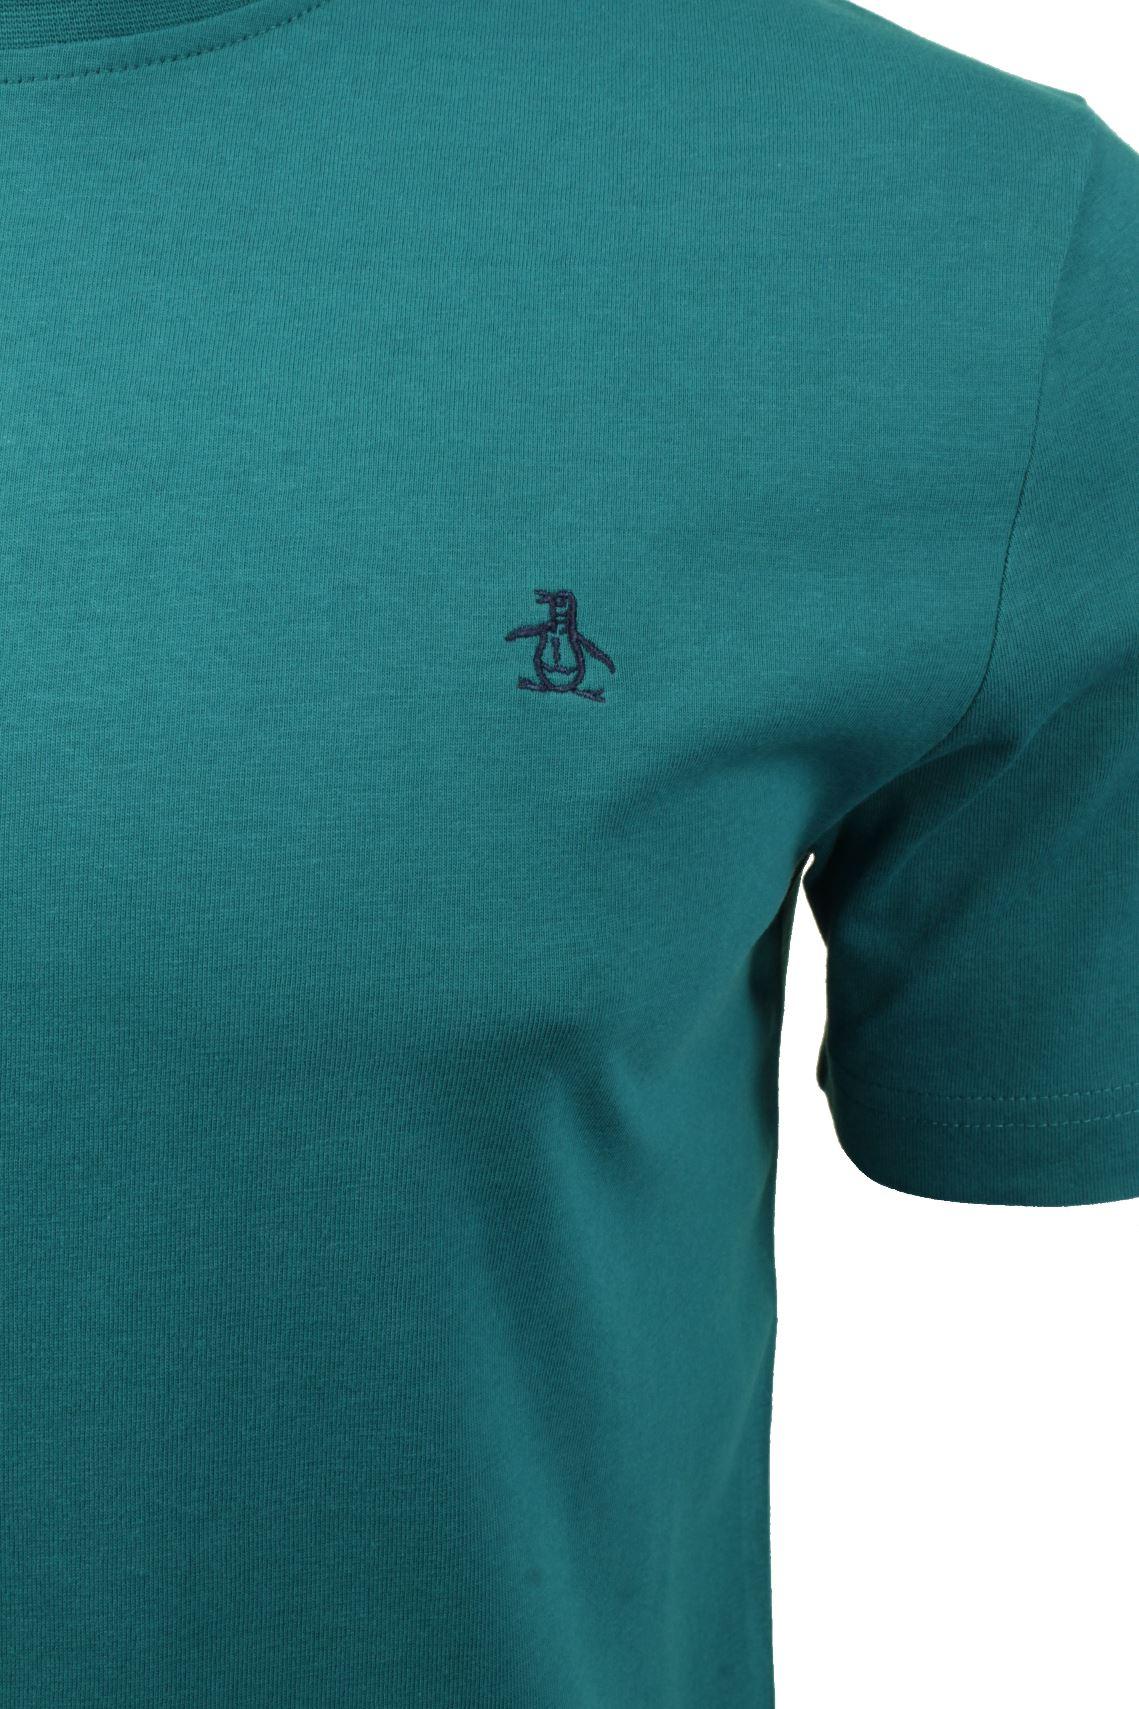 Mens-T-Shirt-by-Original-Penguin-Crew-Neck-Short-Sleeved thumbnail 19